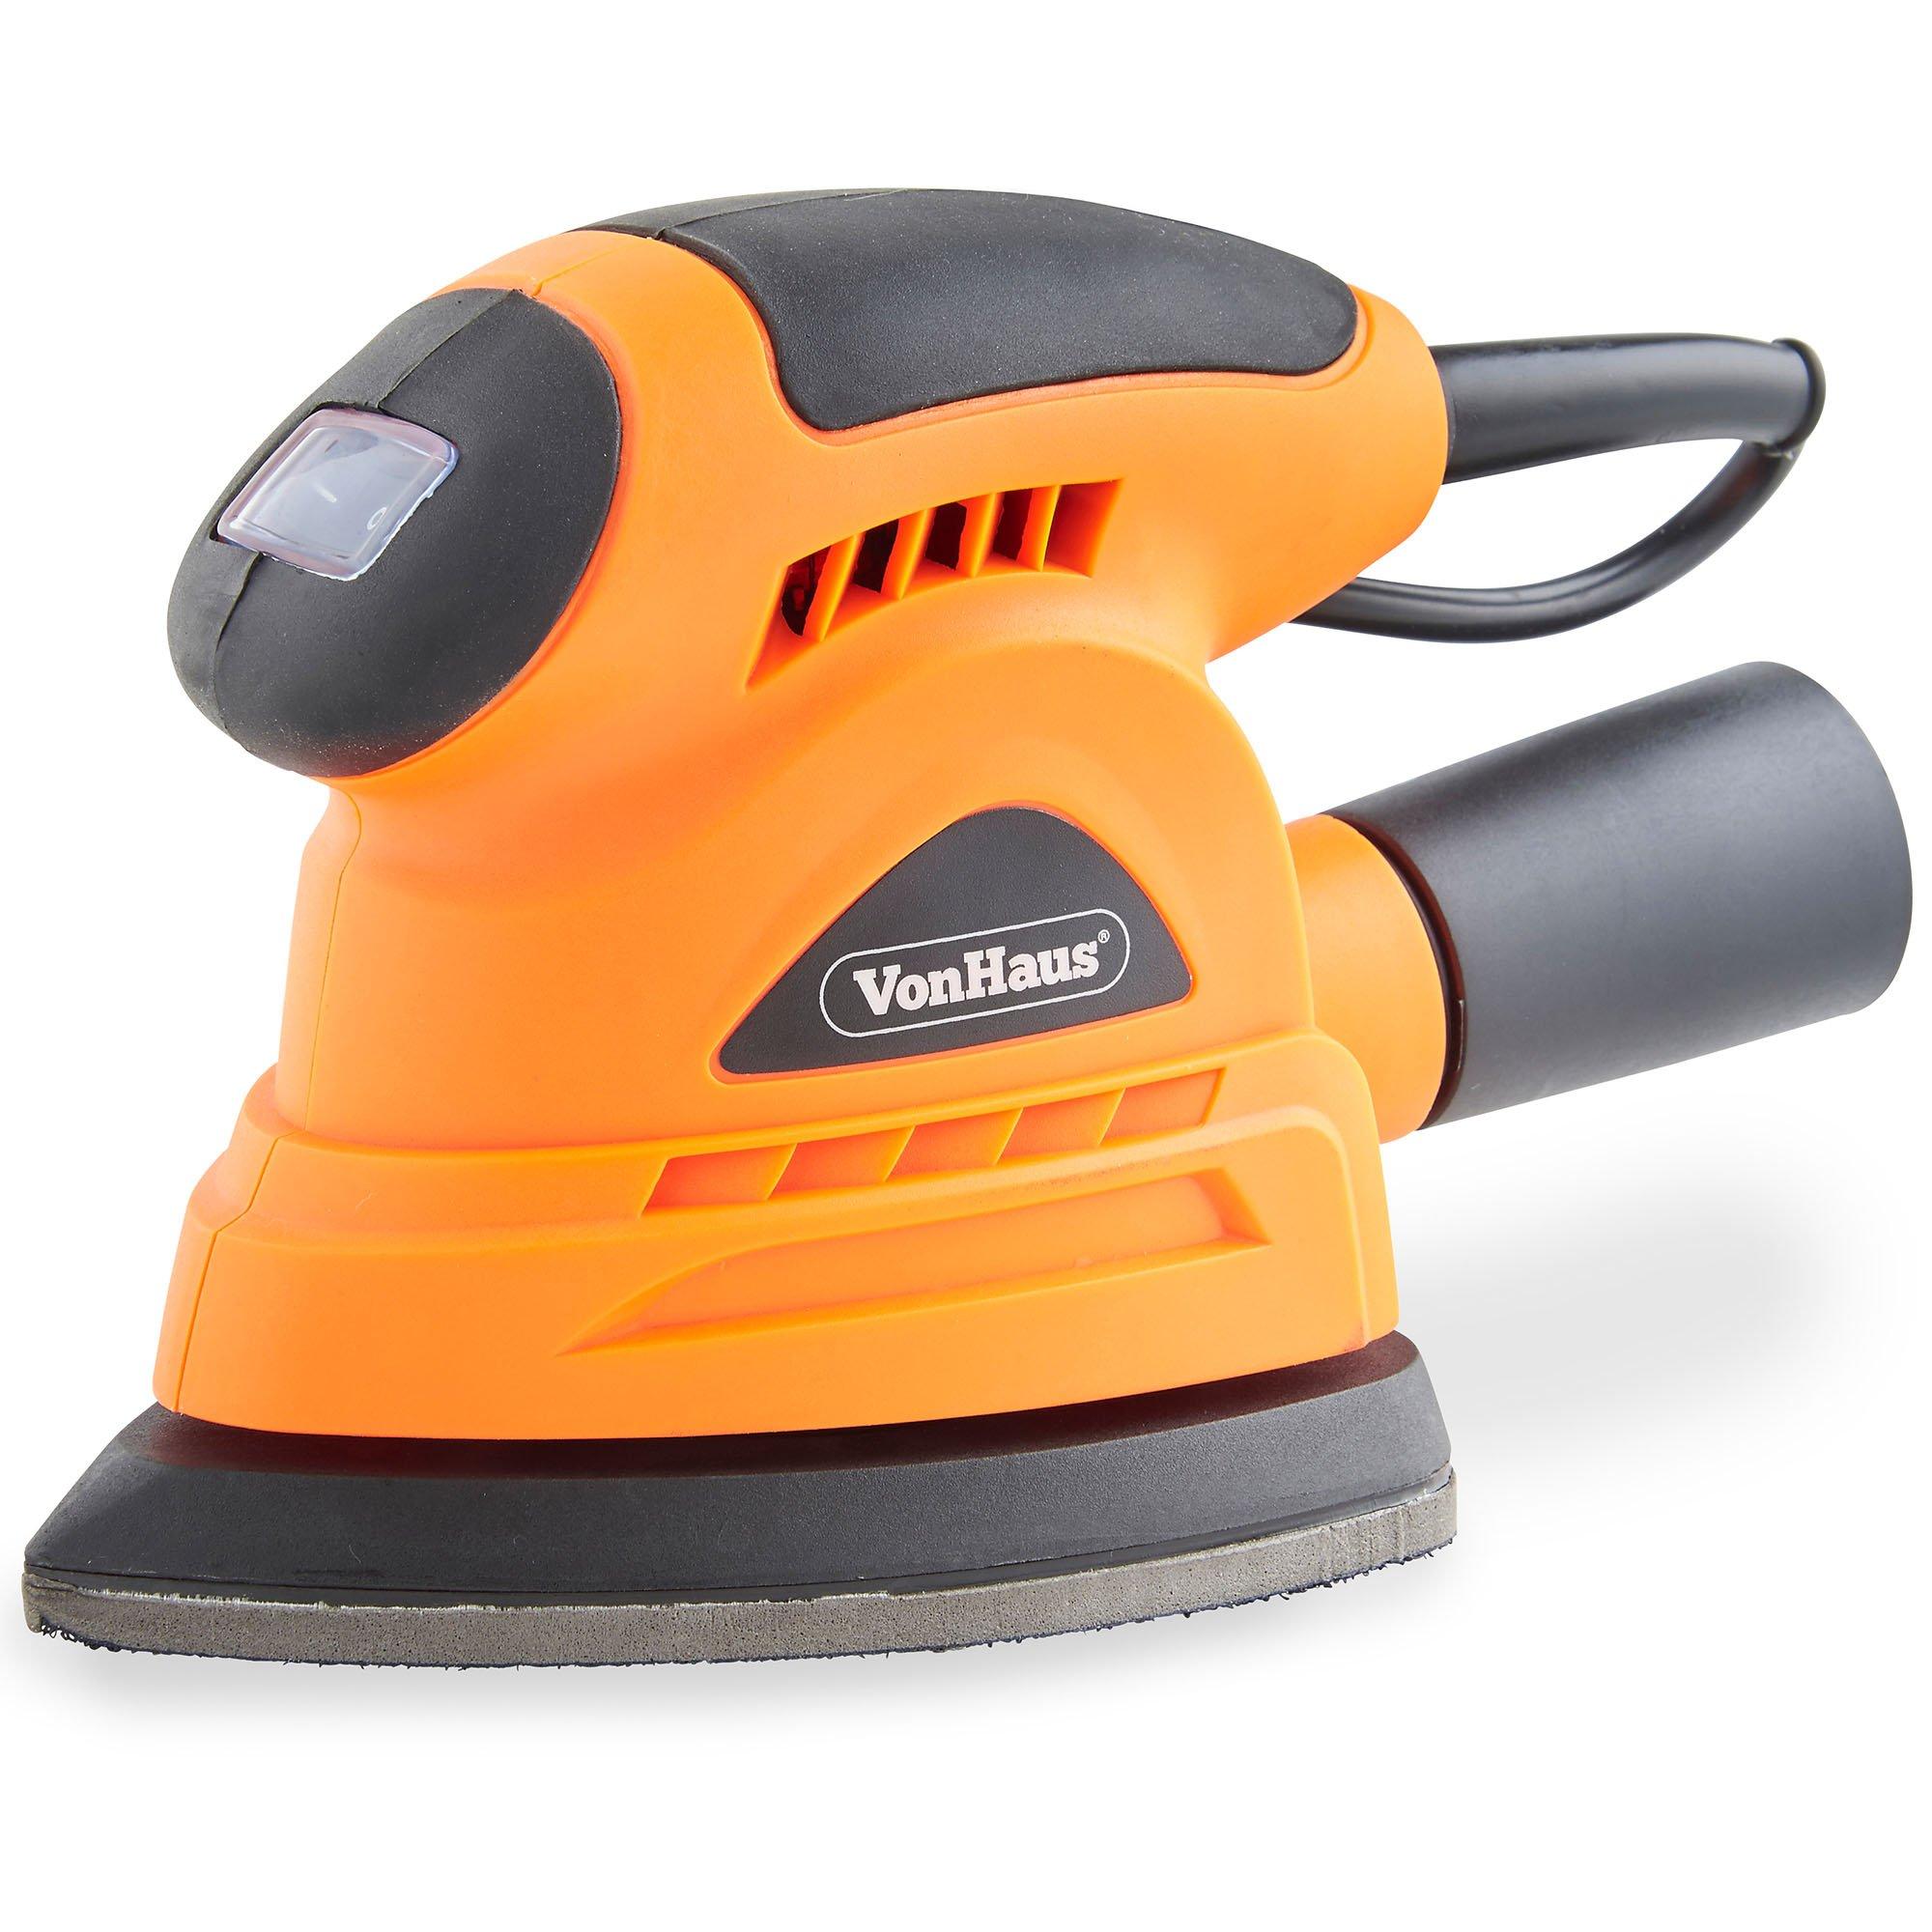 Amazon.com: Customer reviews: Black & Decker MS800B Mouse ...